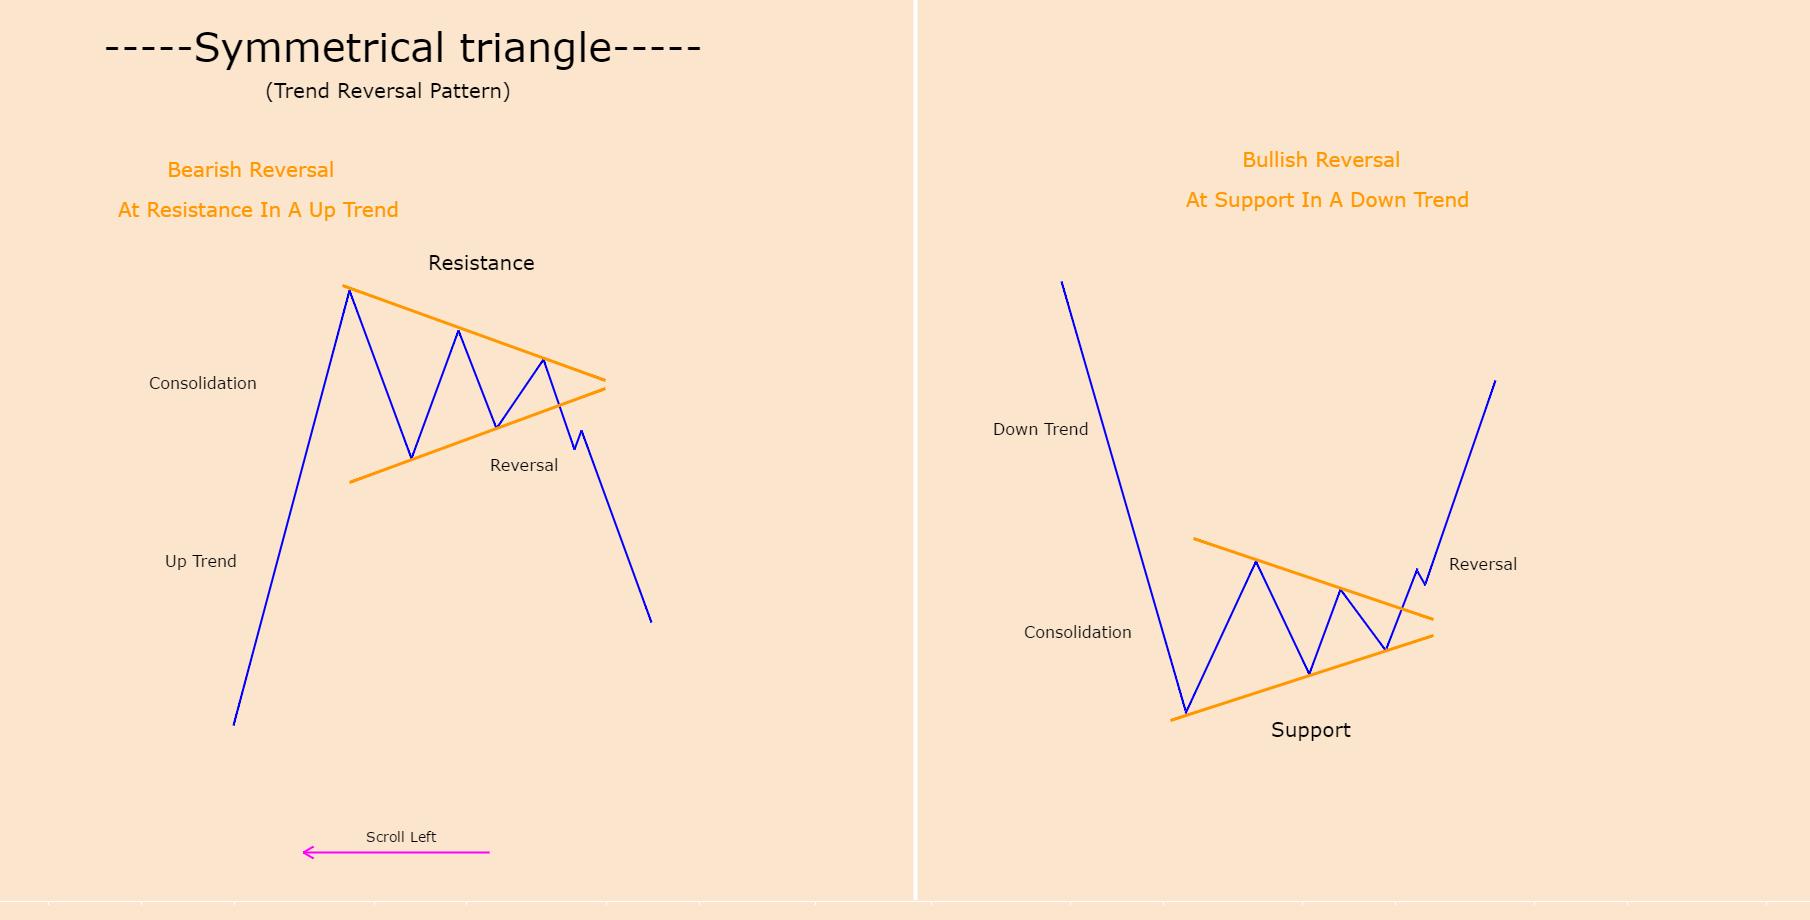 SYMMETRICAL TRIANGLE (TREND REVERSAL)